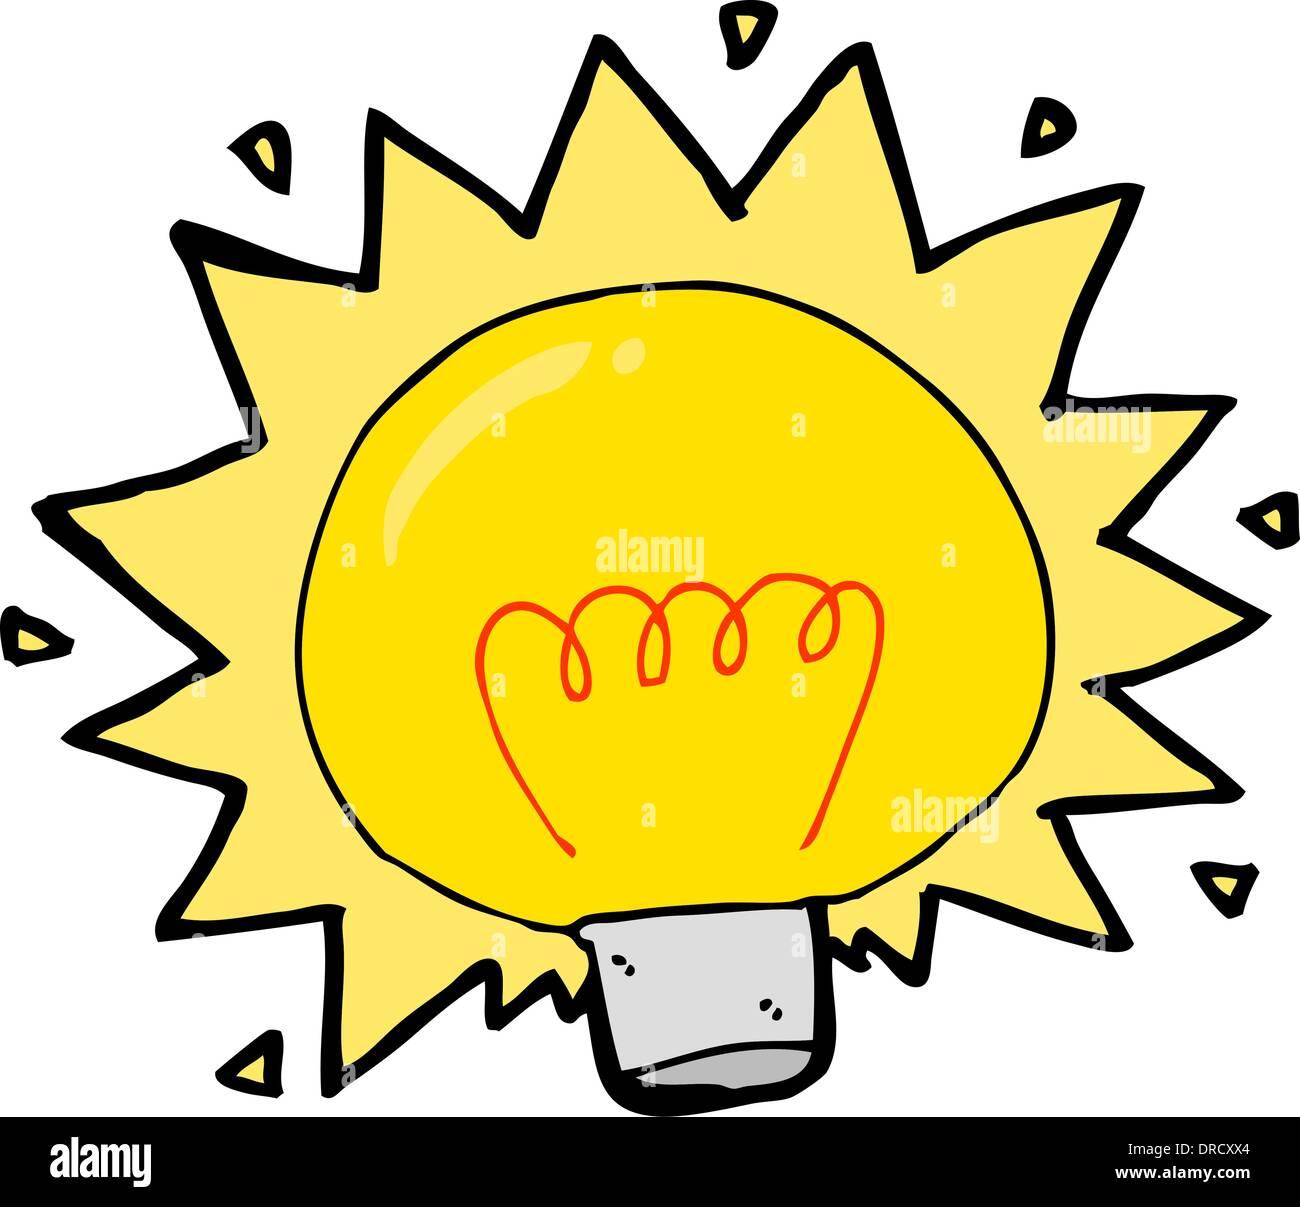 Cartoon electric light bulb stock vector art illustration vector cartoon electric light bulb publicscrutiny Images